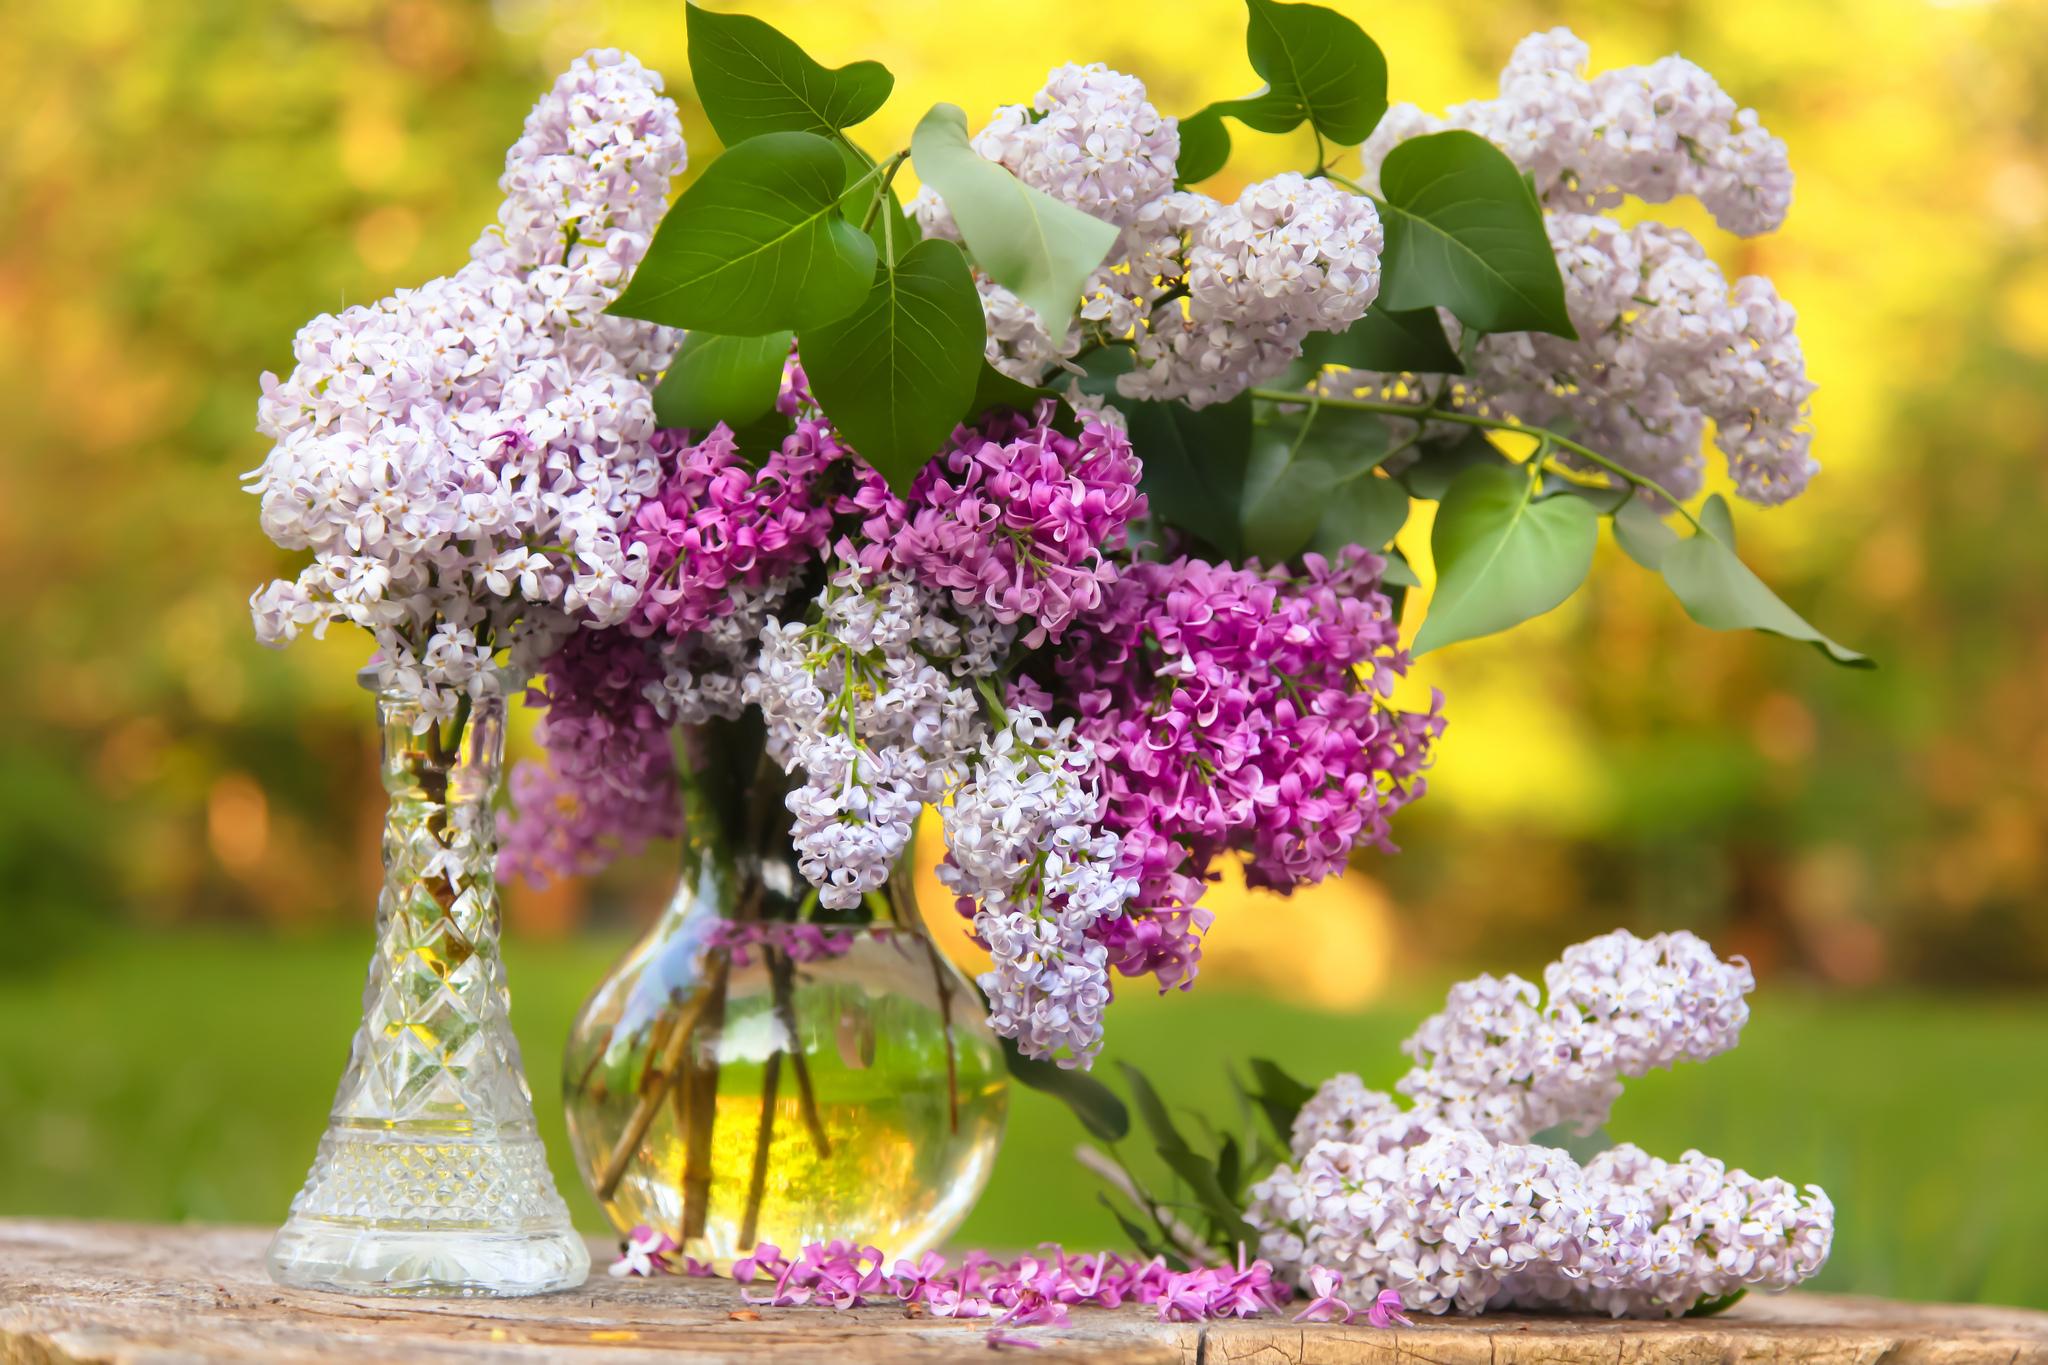 Красивые фото цветов сирени